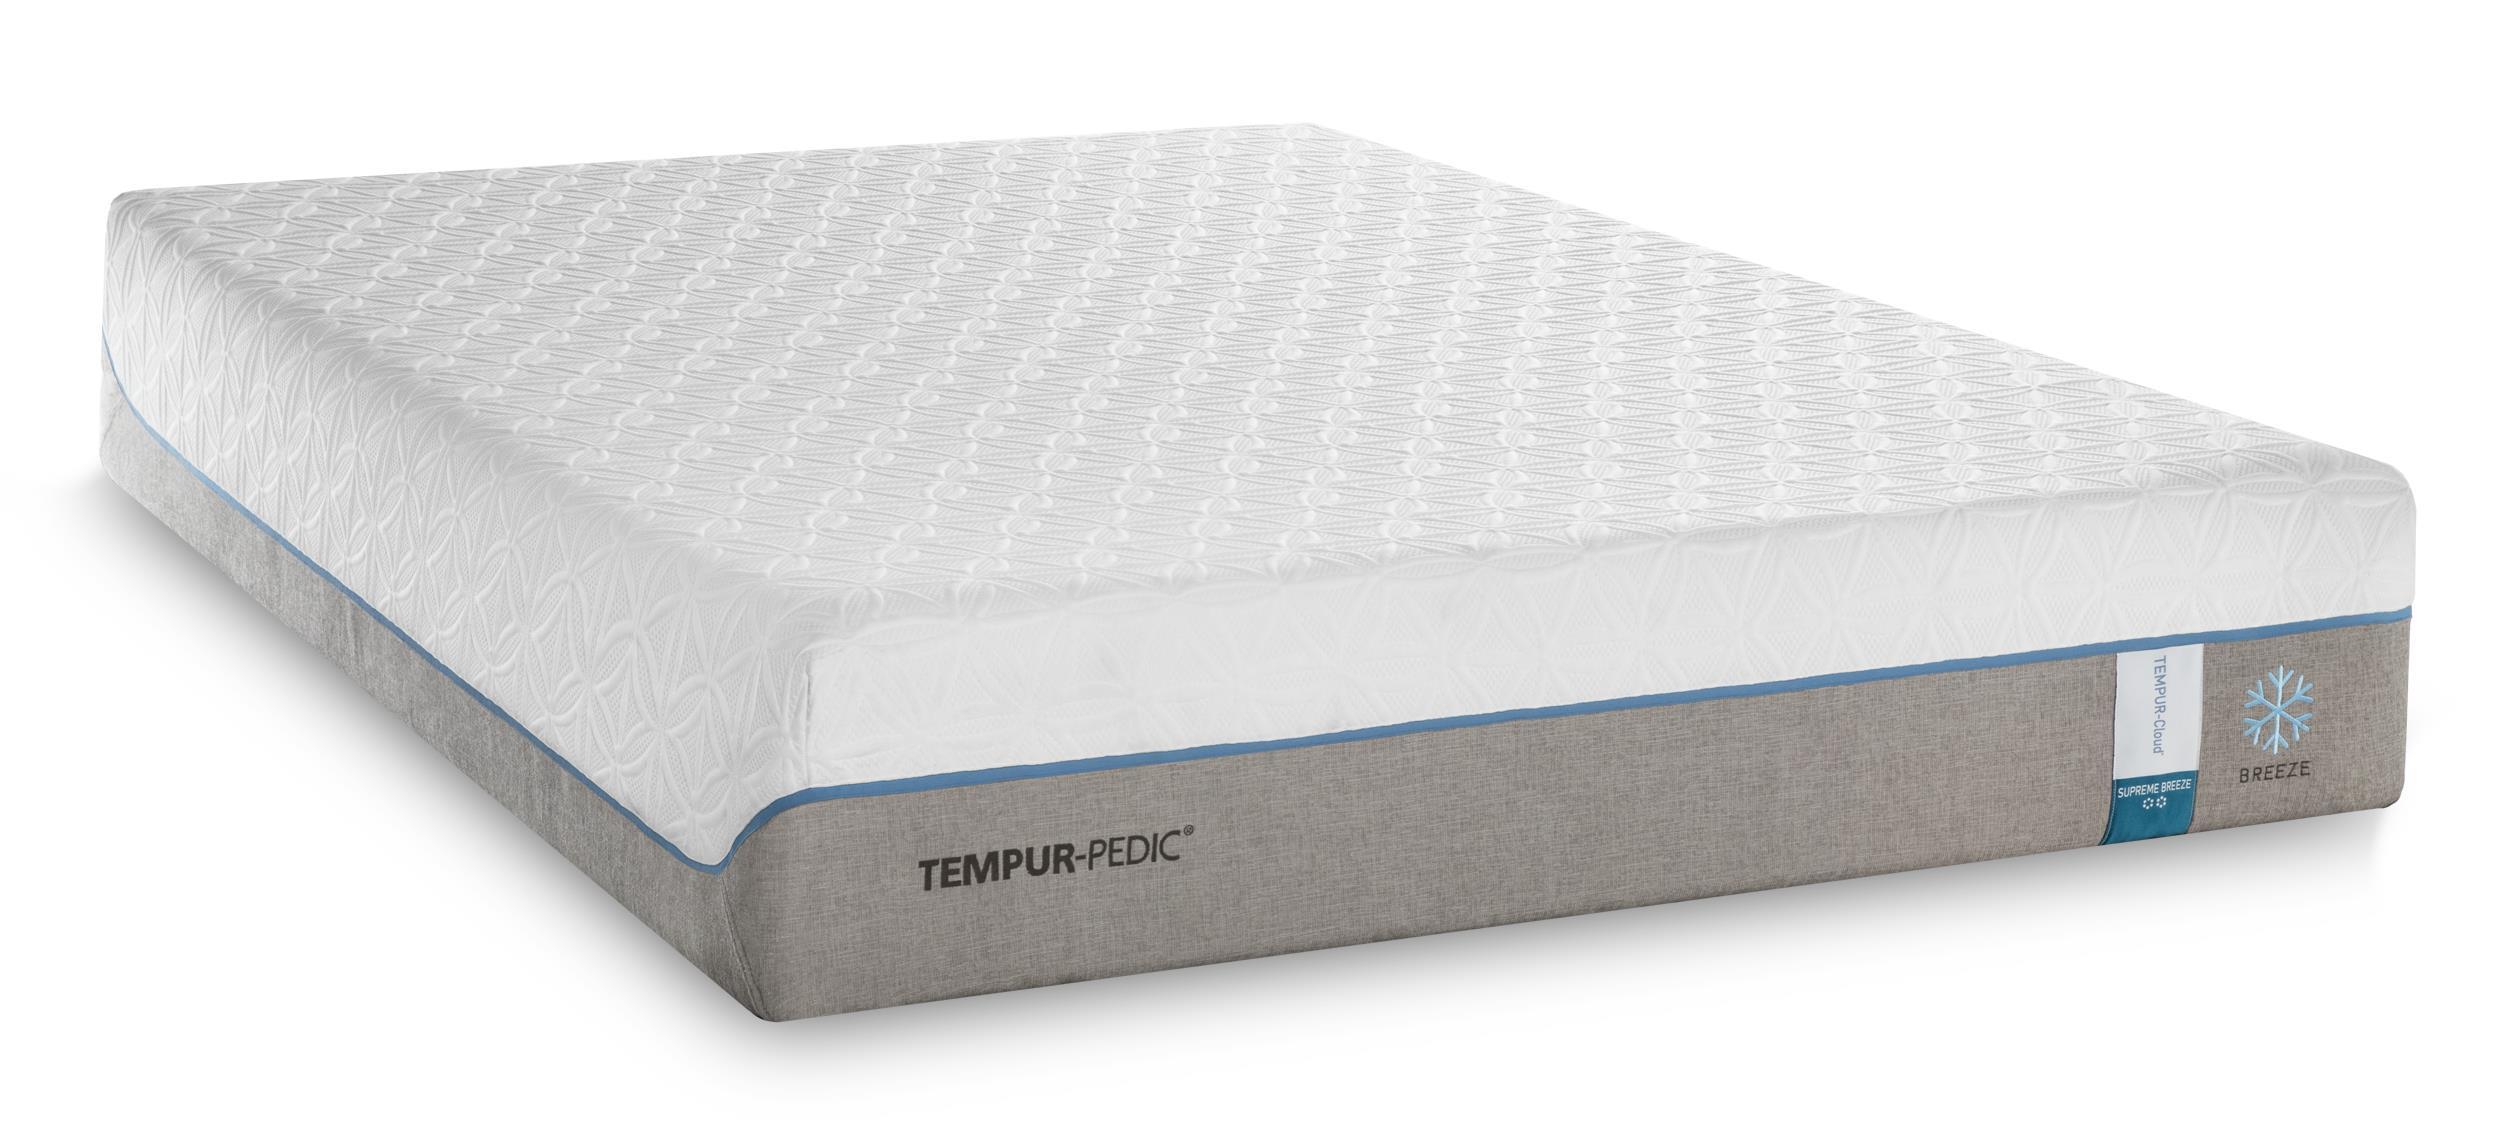 Tempur-Pedic® TEMPUR-Cloud Supreme Breeze 2 Twin Extra Long Soft Mattress Set - Item Number: 10103220+25289220